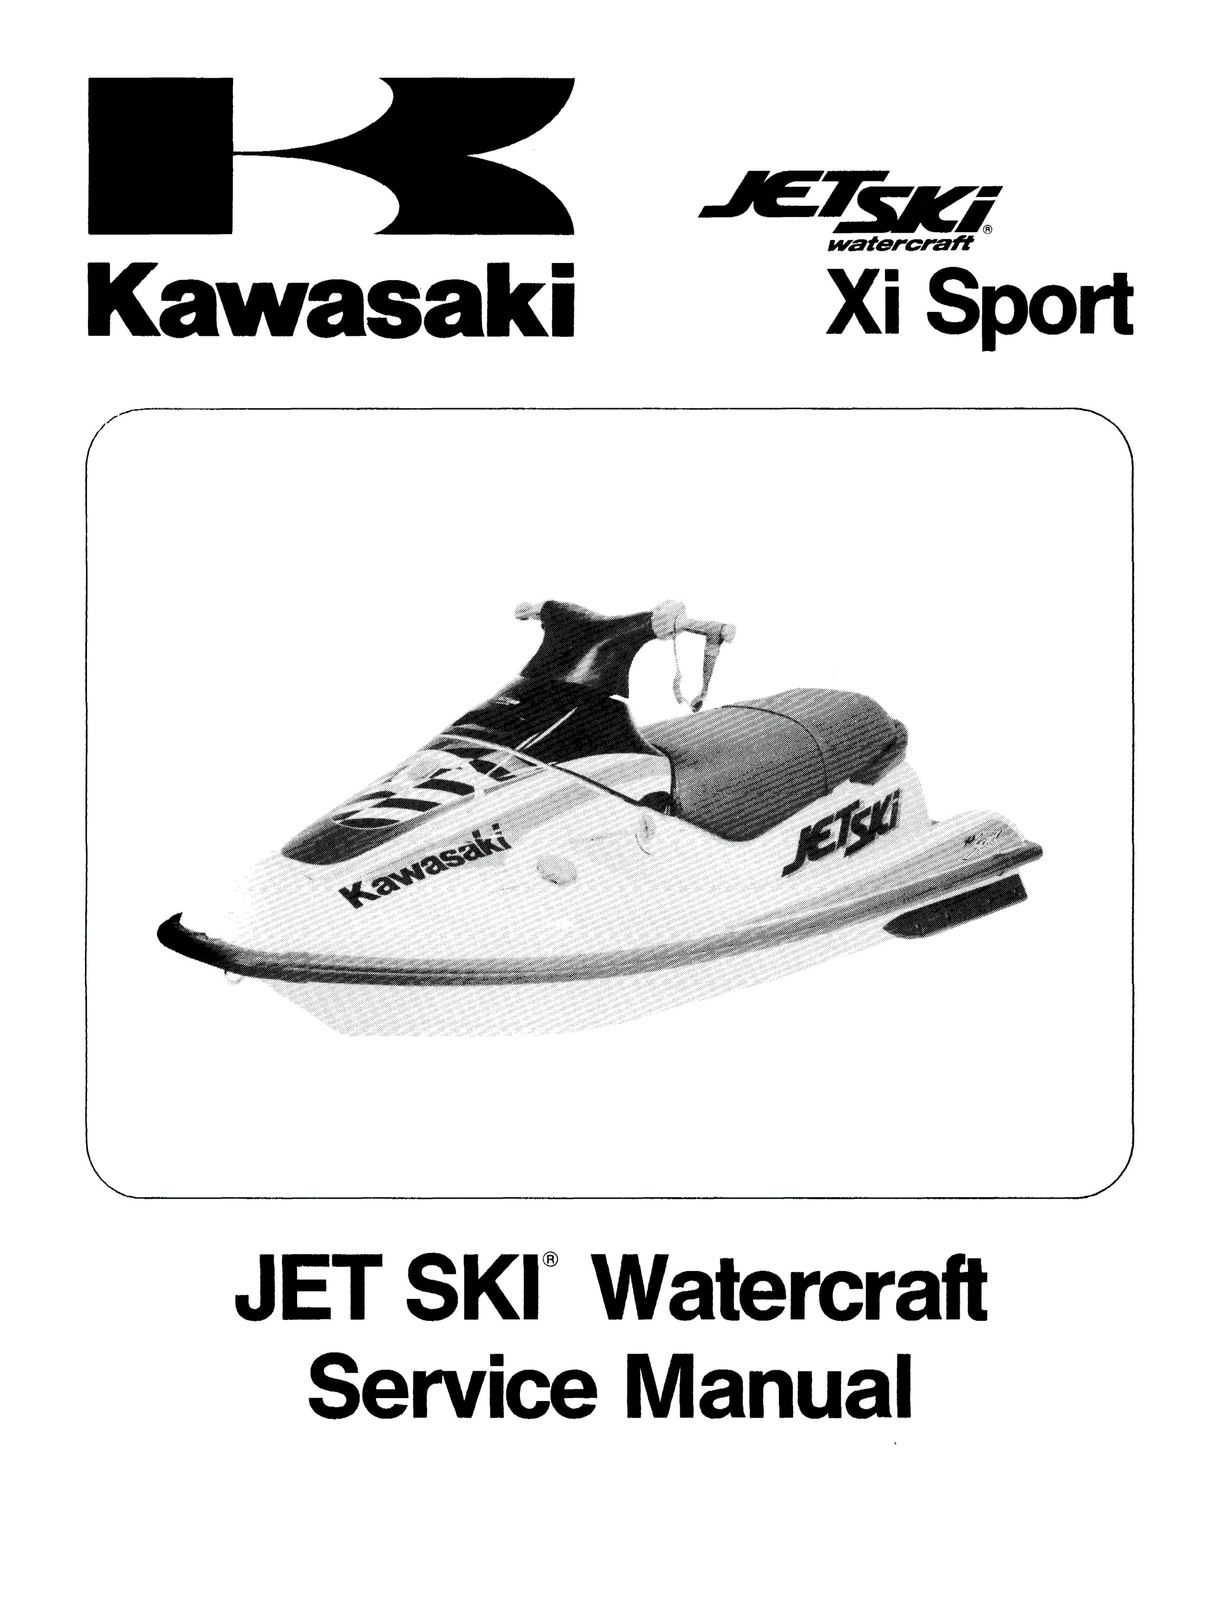 Jetski xi sport 1998 service manual